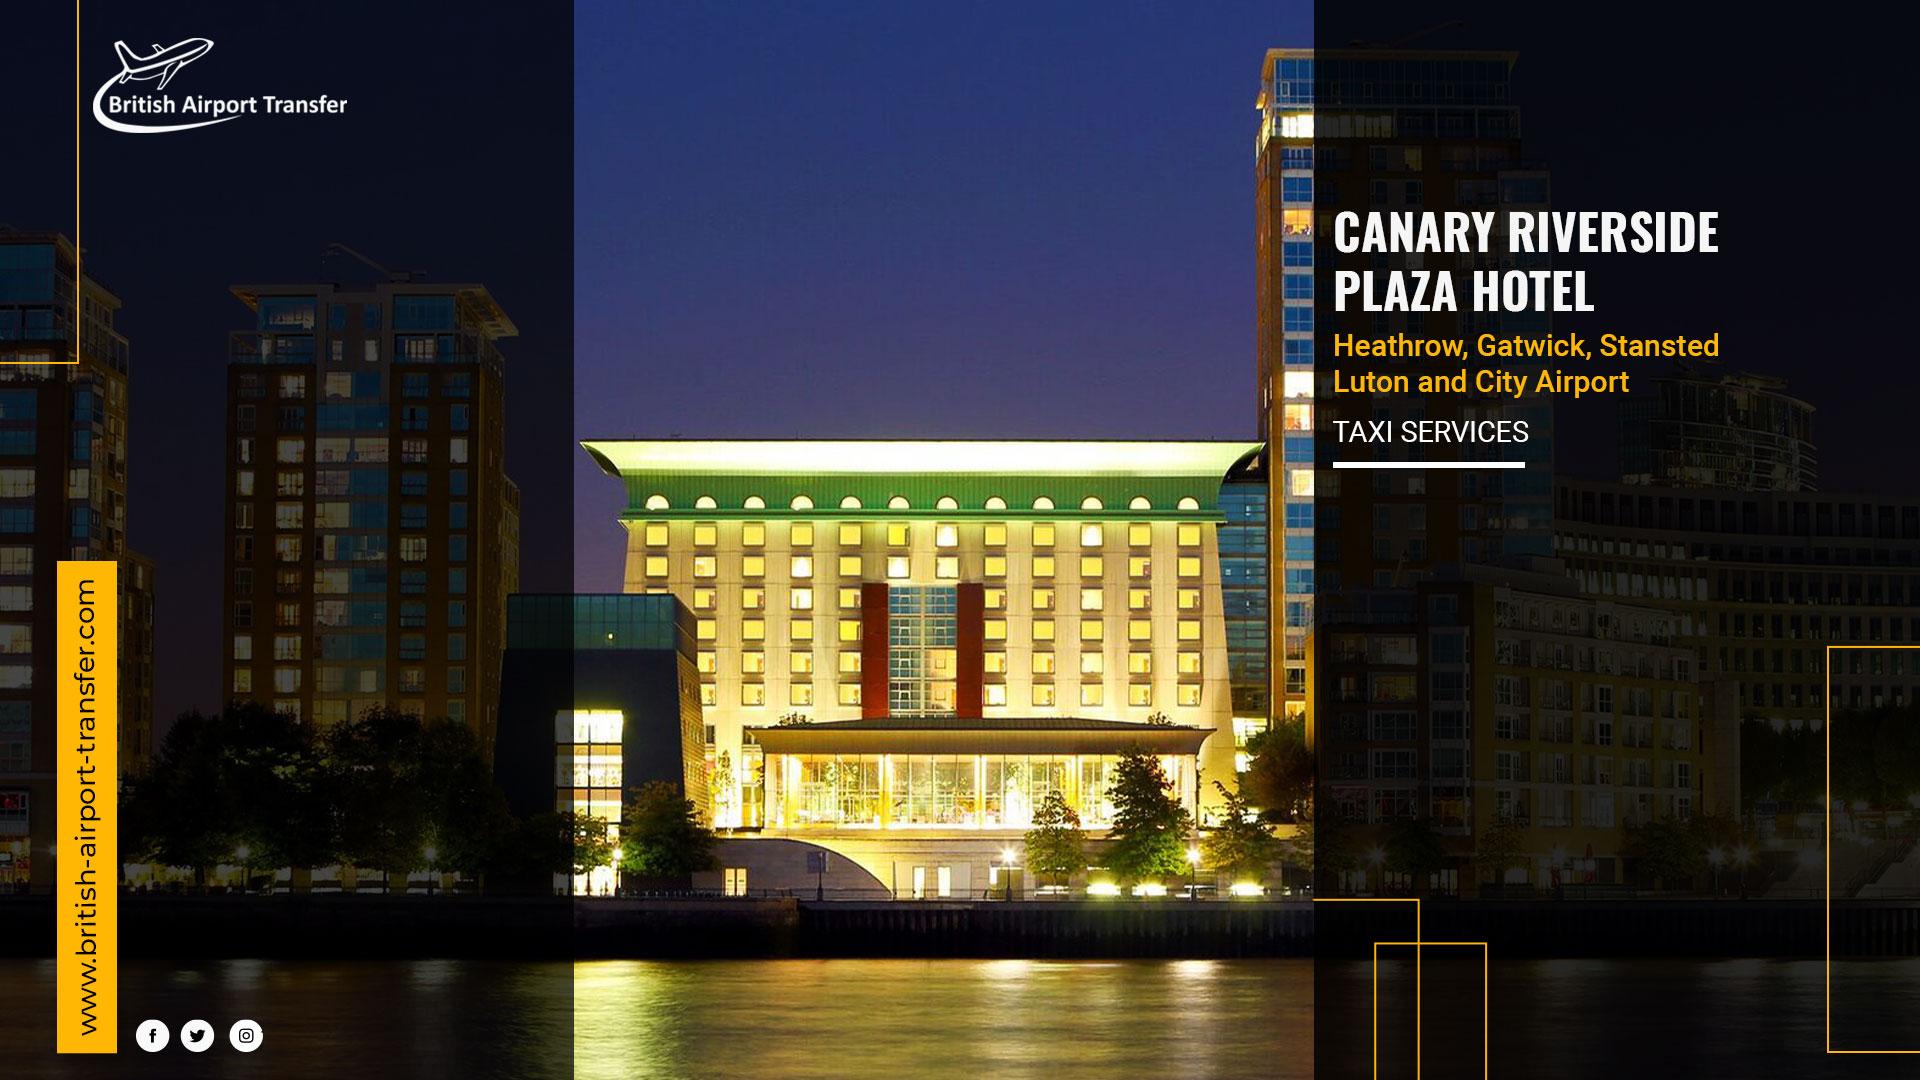 Taxi Service – Canary Riverside Plaza Hotel / E14 8RS